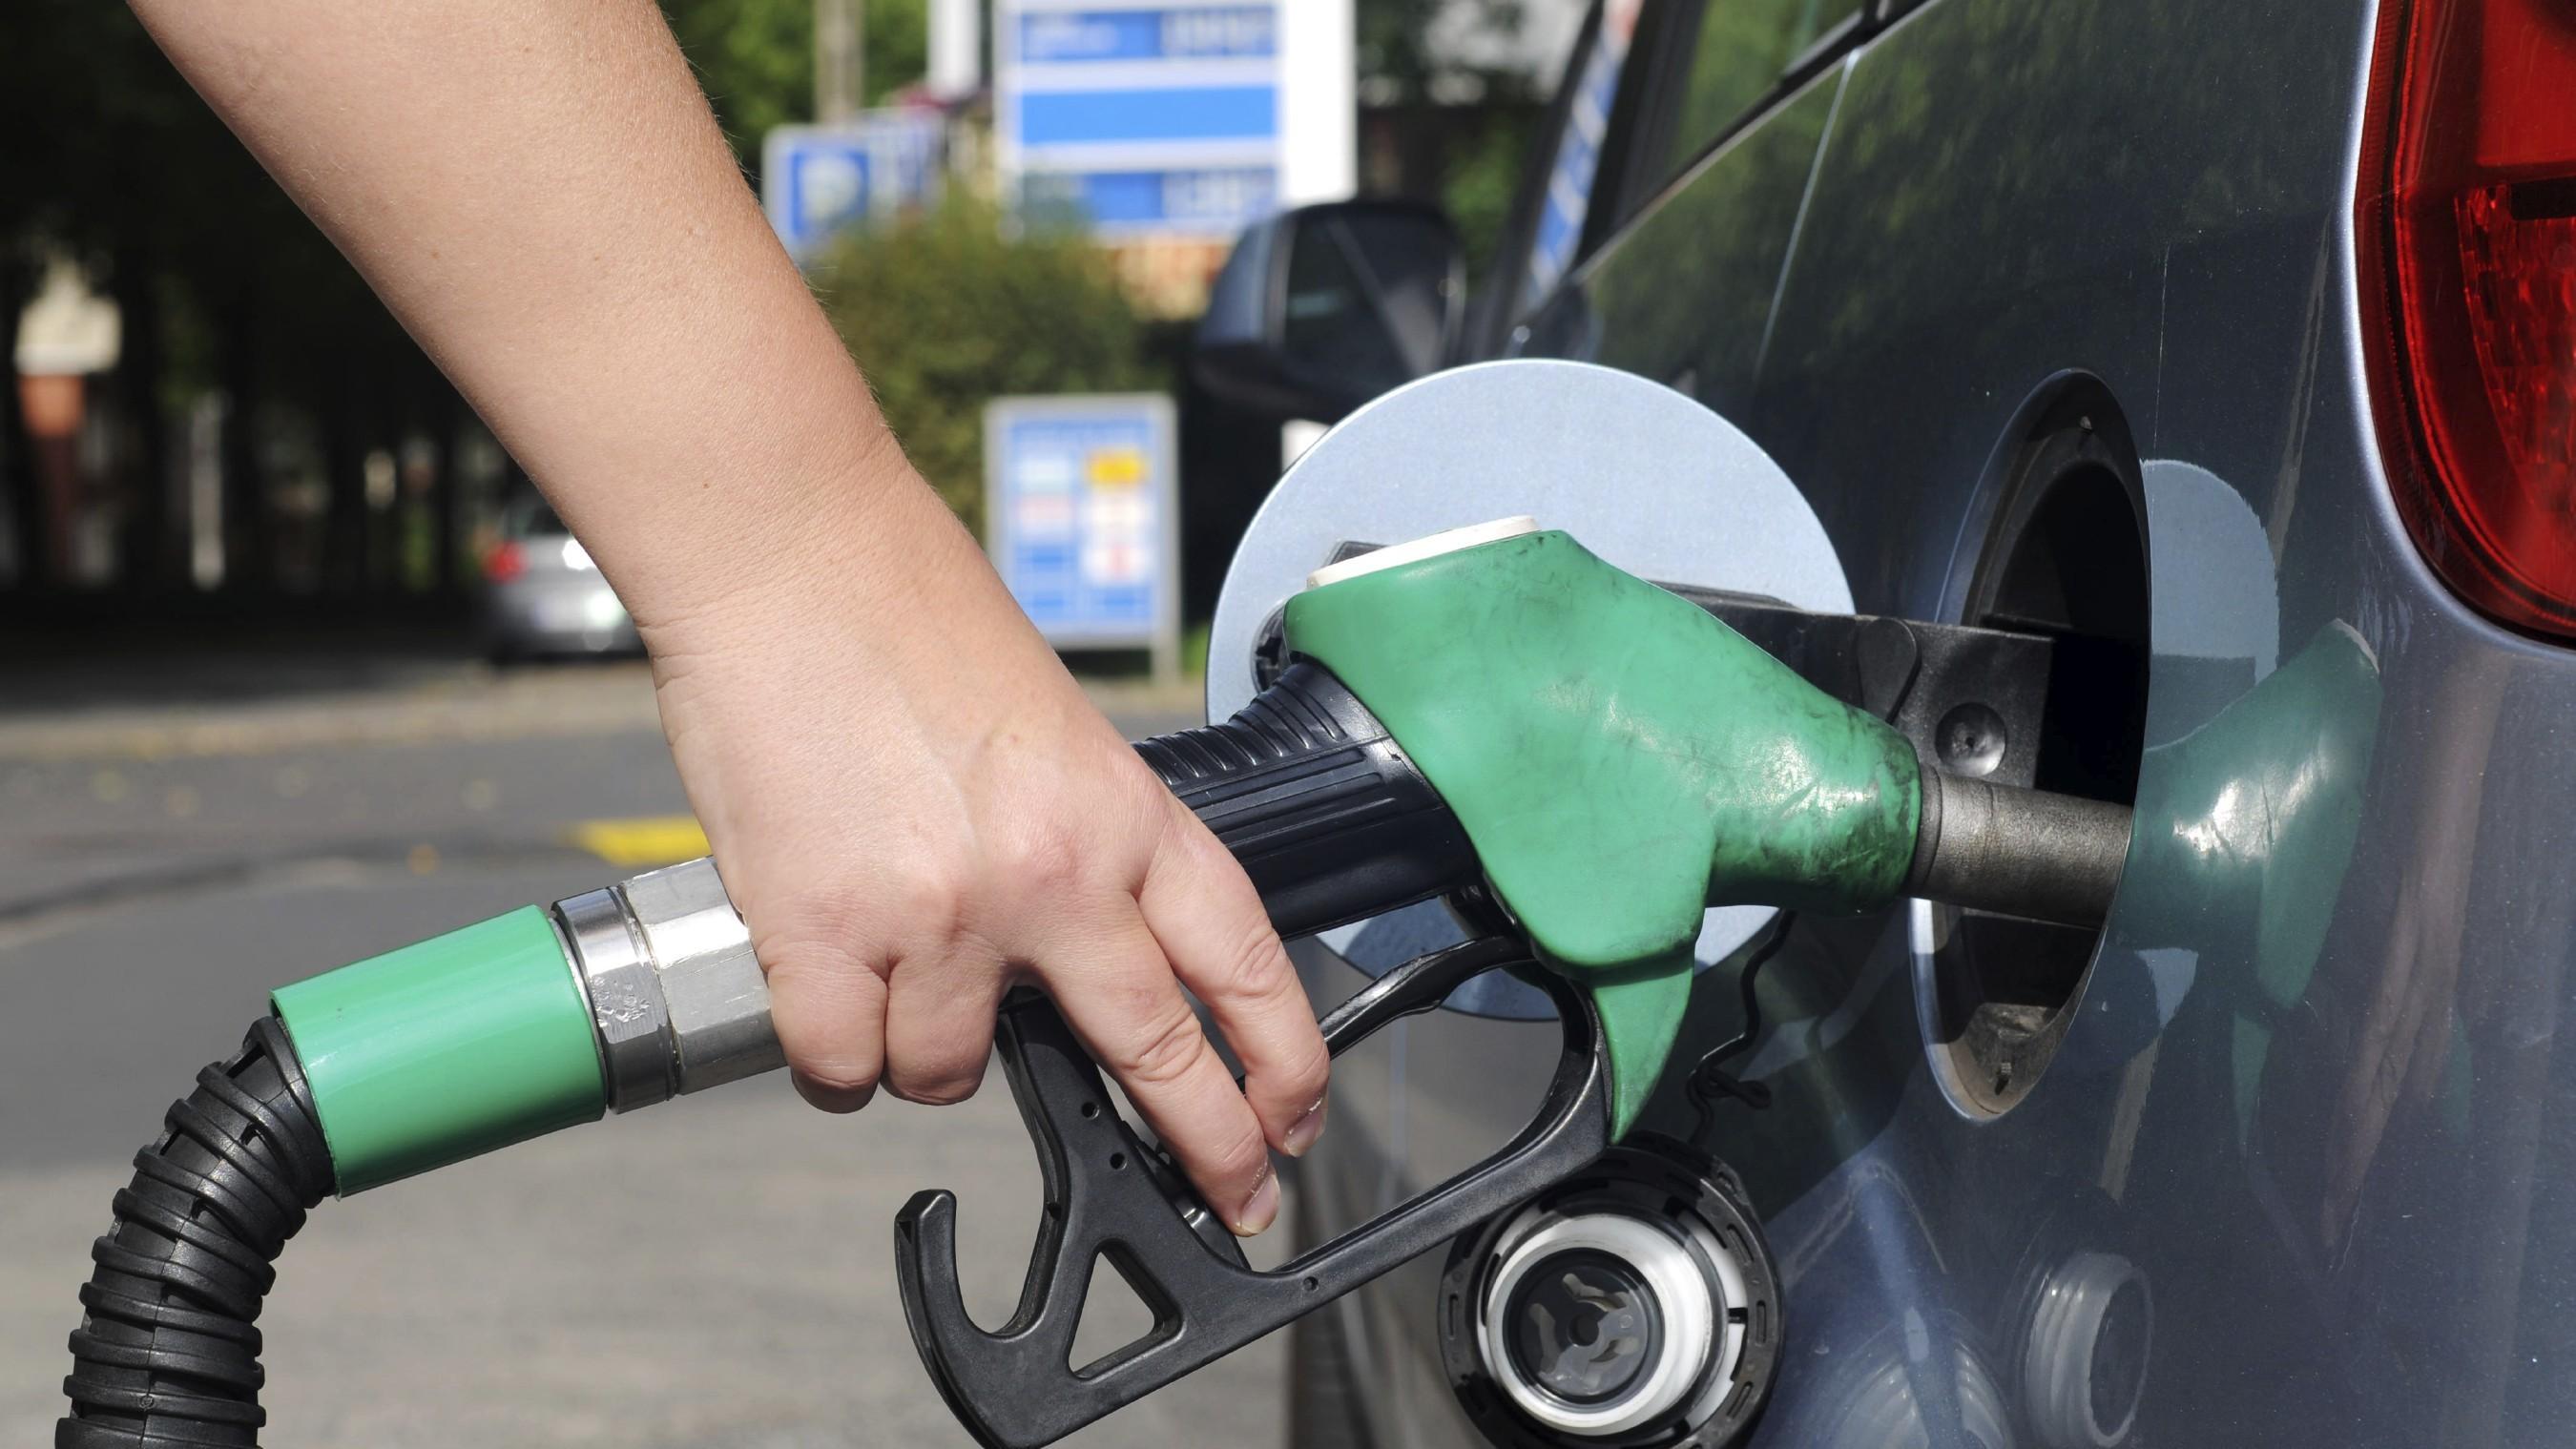 Залили дизель вместо бензина